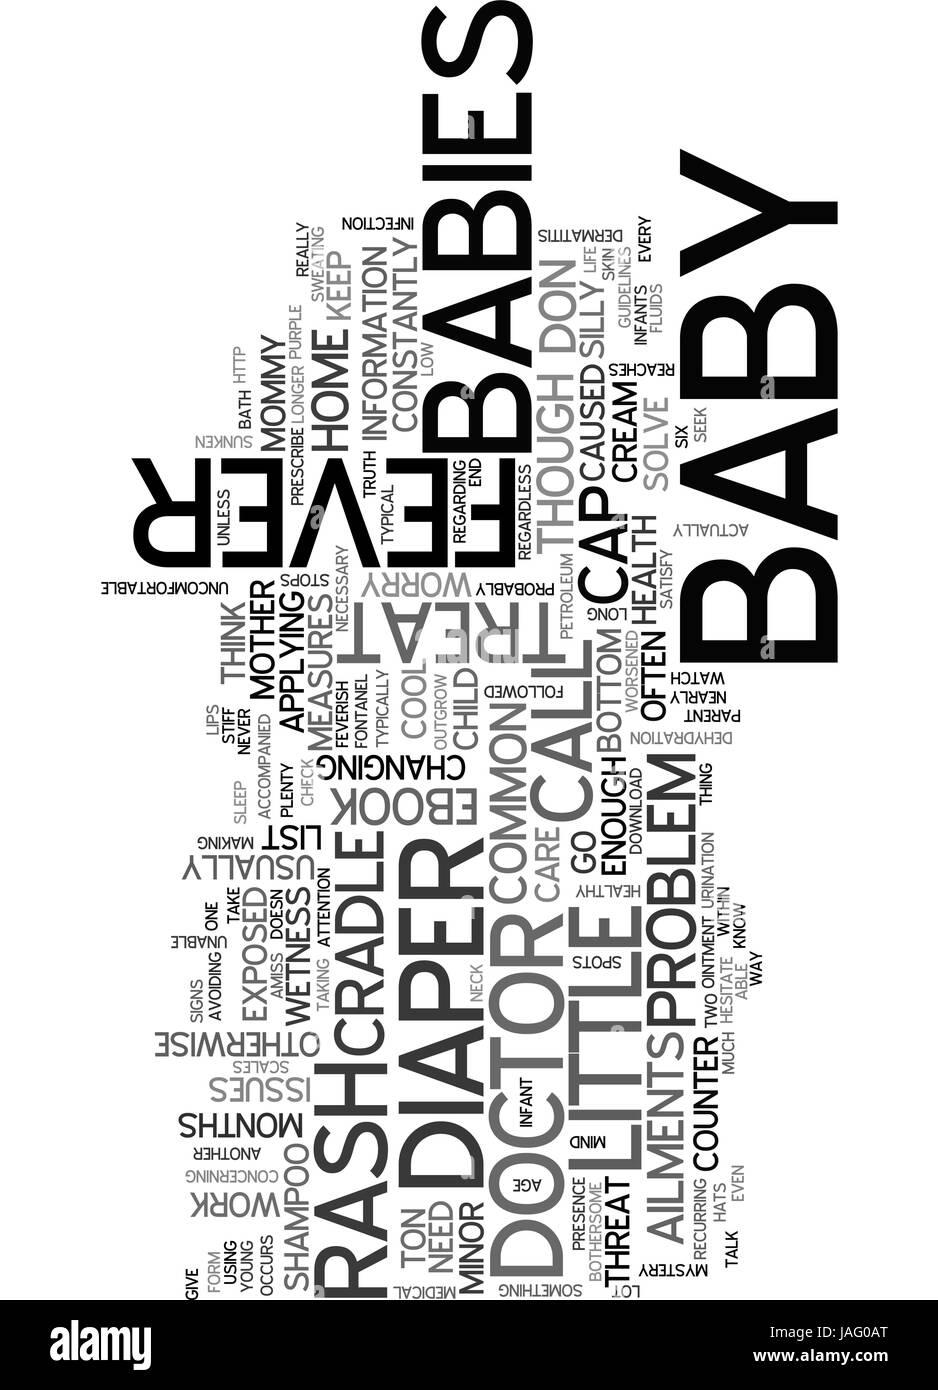 BABIES MINOR MALADIES TEXT WORD CLOUD CONCEPT - Stock Image